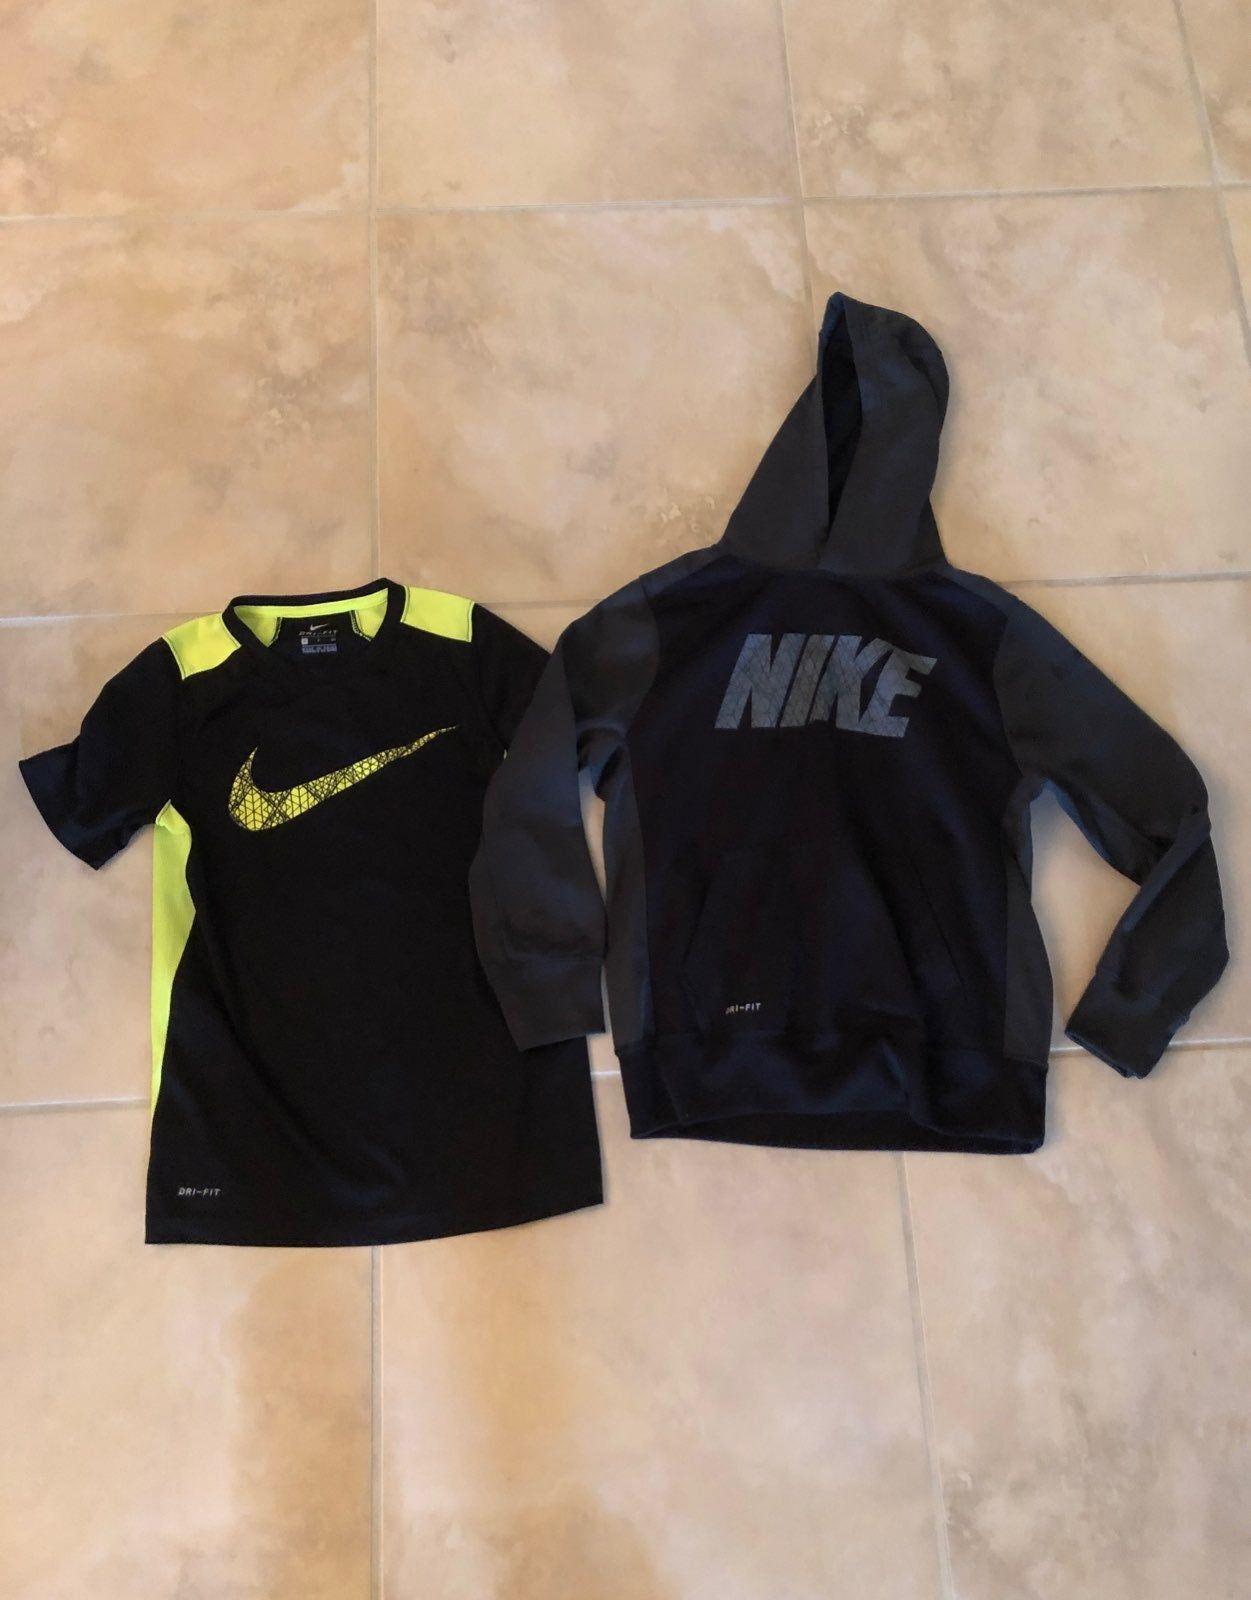 Boys Nike Dry Fit Sweatshirt Size Medium And Shirt Size Small Both In Excellent Condition Smoke Free Home Lots Of Sweatshirt Tops Boys Nike Kids Sweatshirt [ 1600 x 1251 Pixel ]